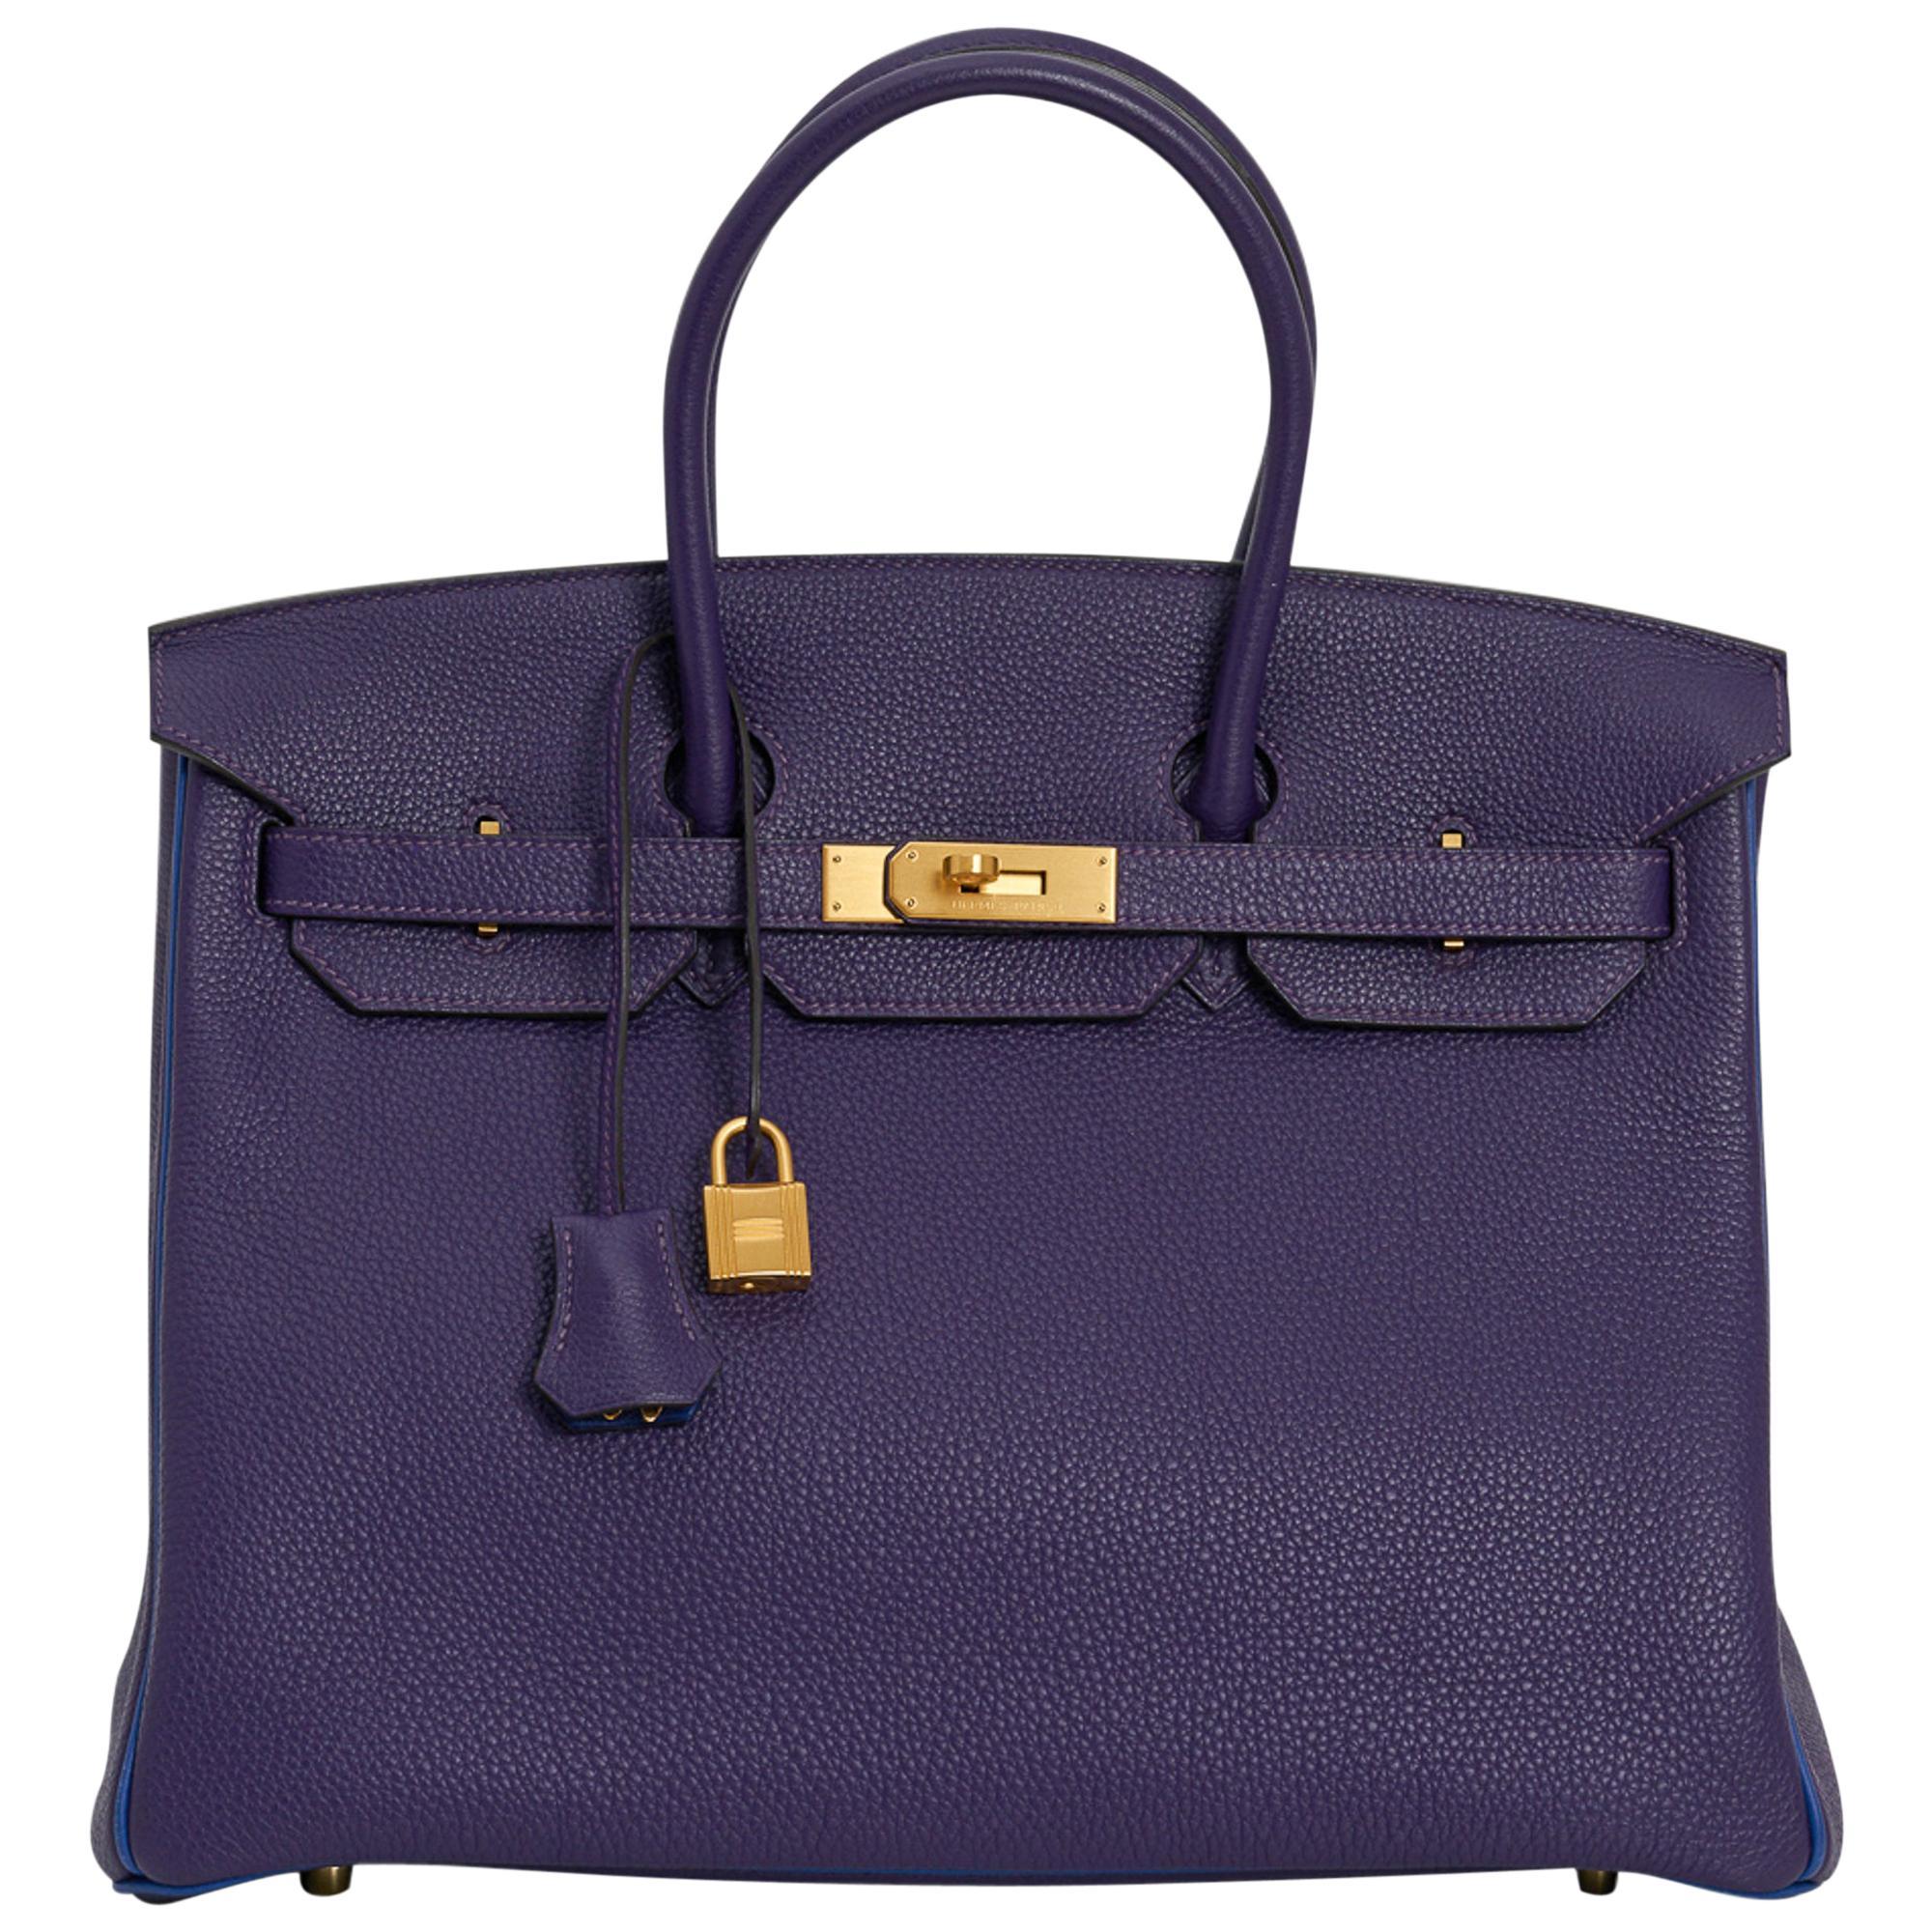 Hermes Birkin 35 Bag HSS Iris / Electric Blue Togo Brushed Gold Hardware